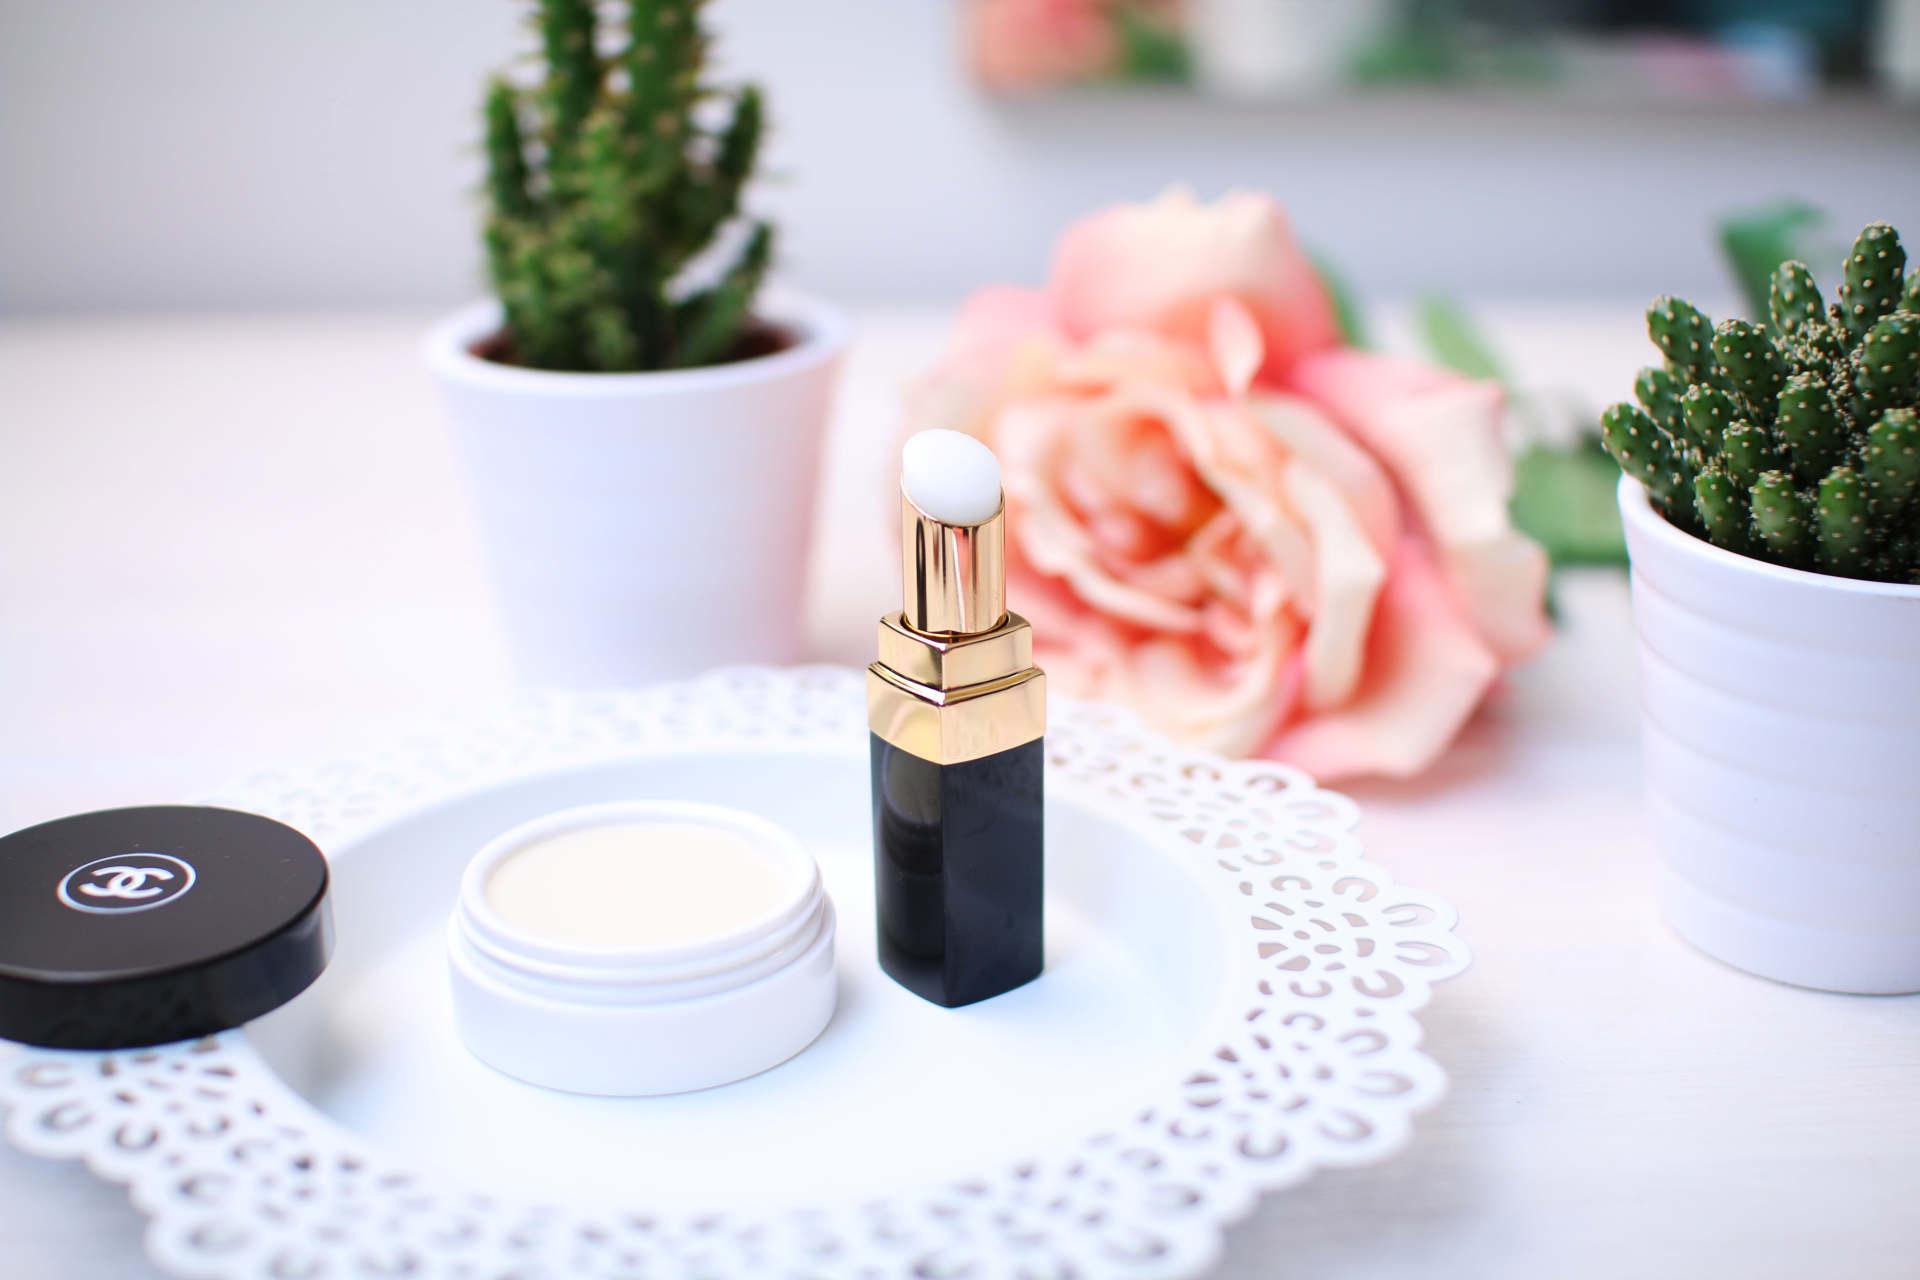 chanel luxury lip balm comparison inthefrow